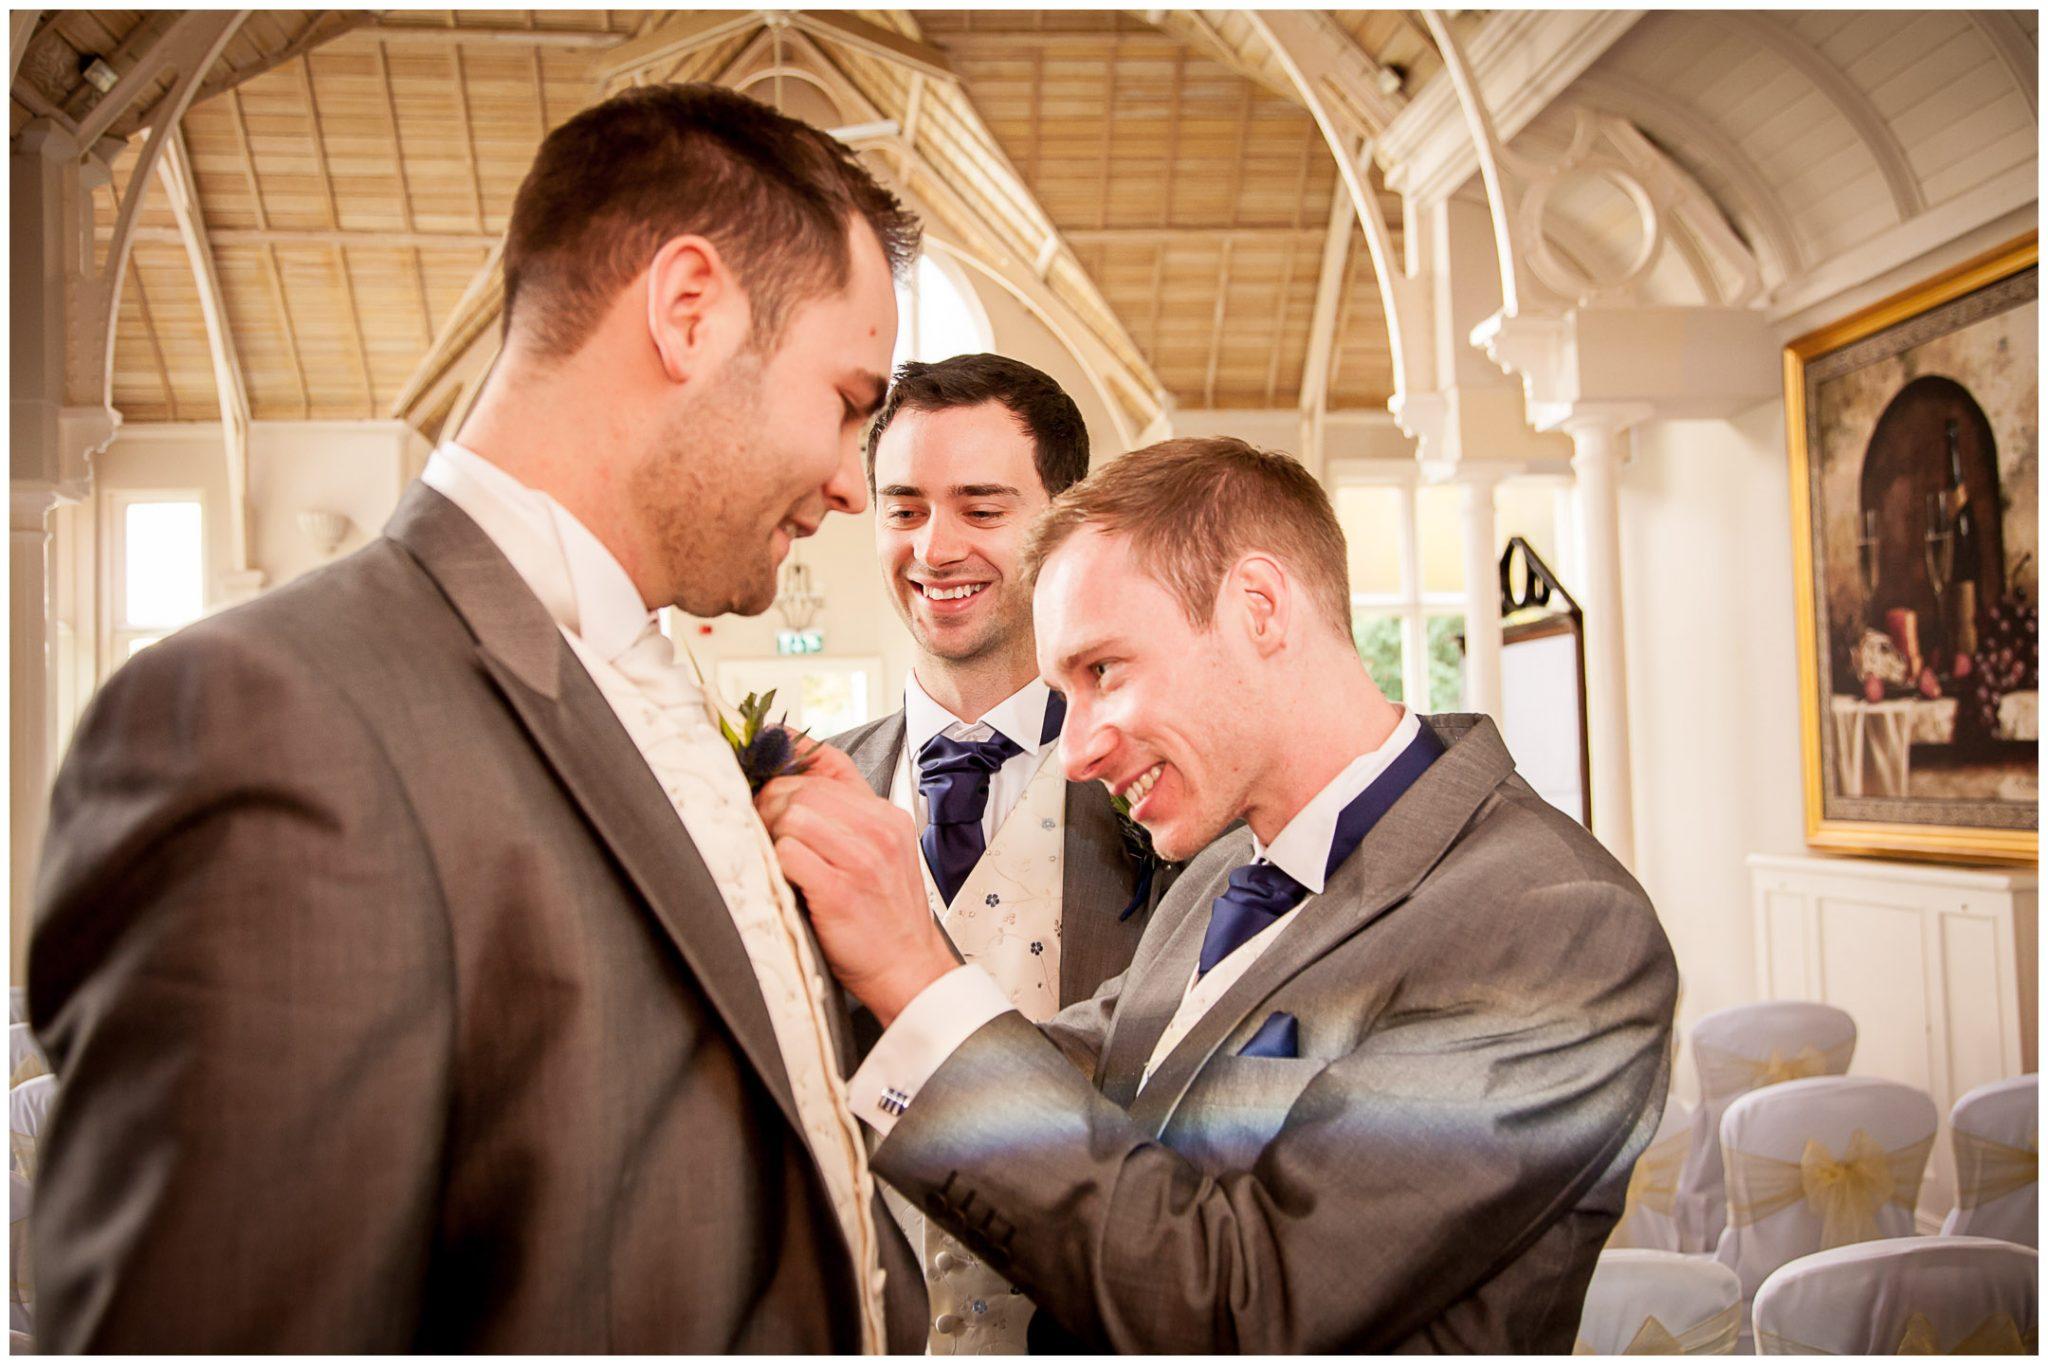 Audleys Wood wedding photography groom with ushers